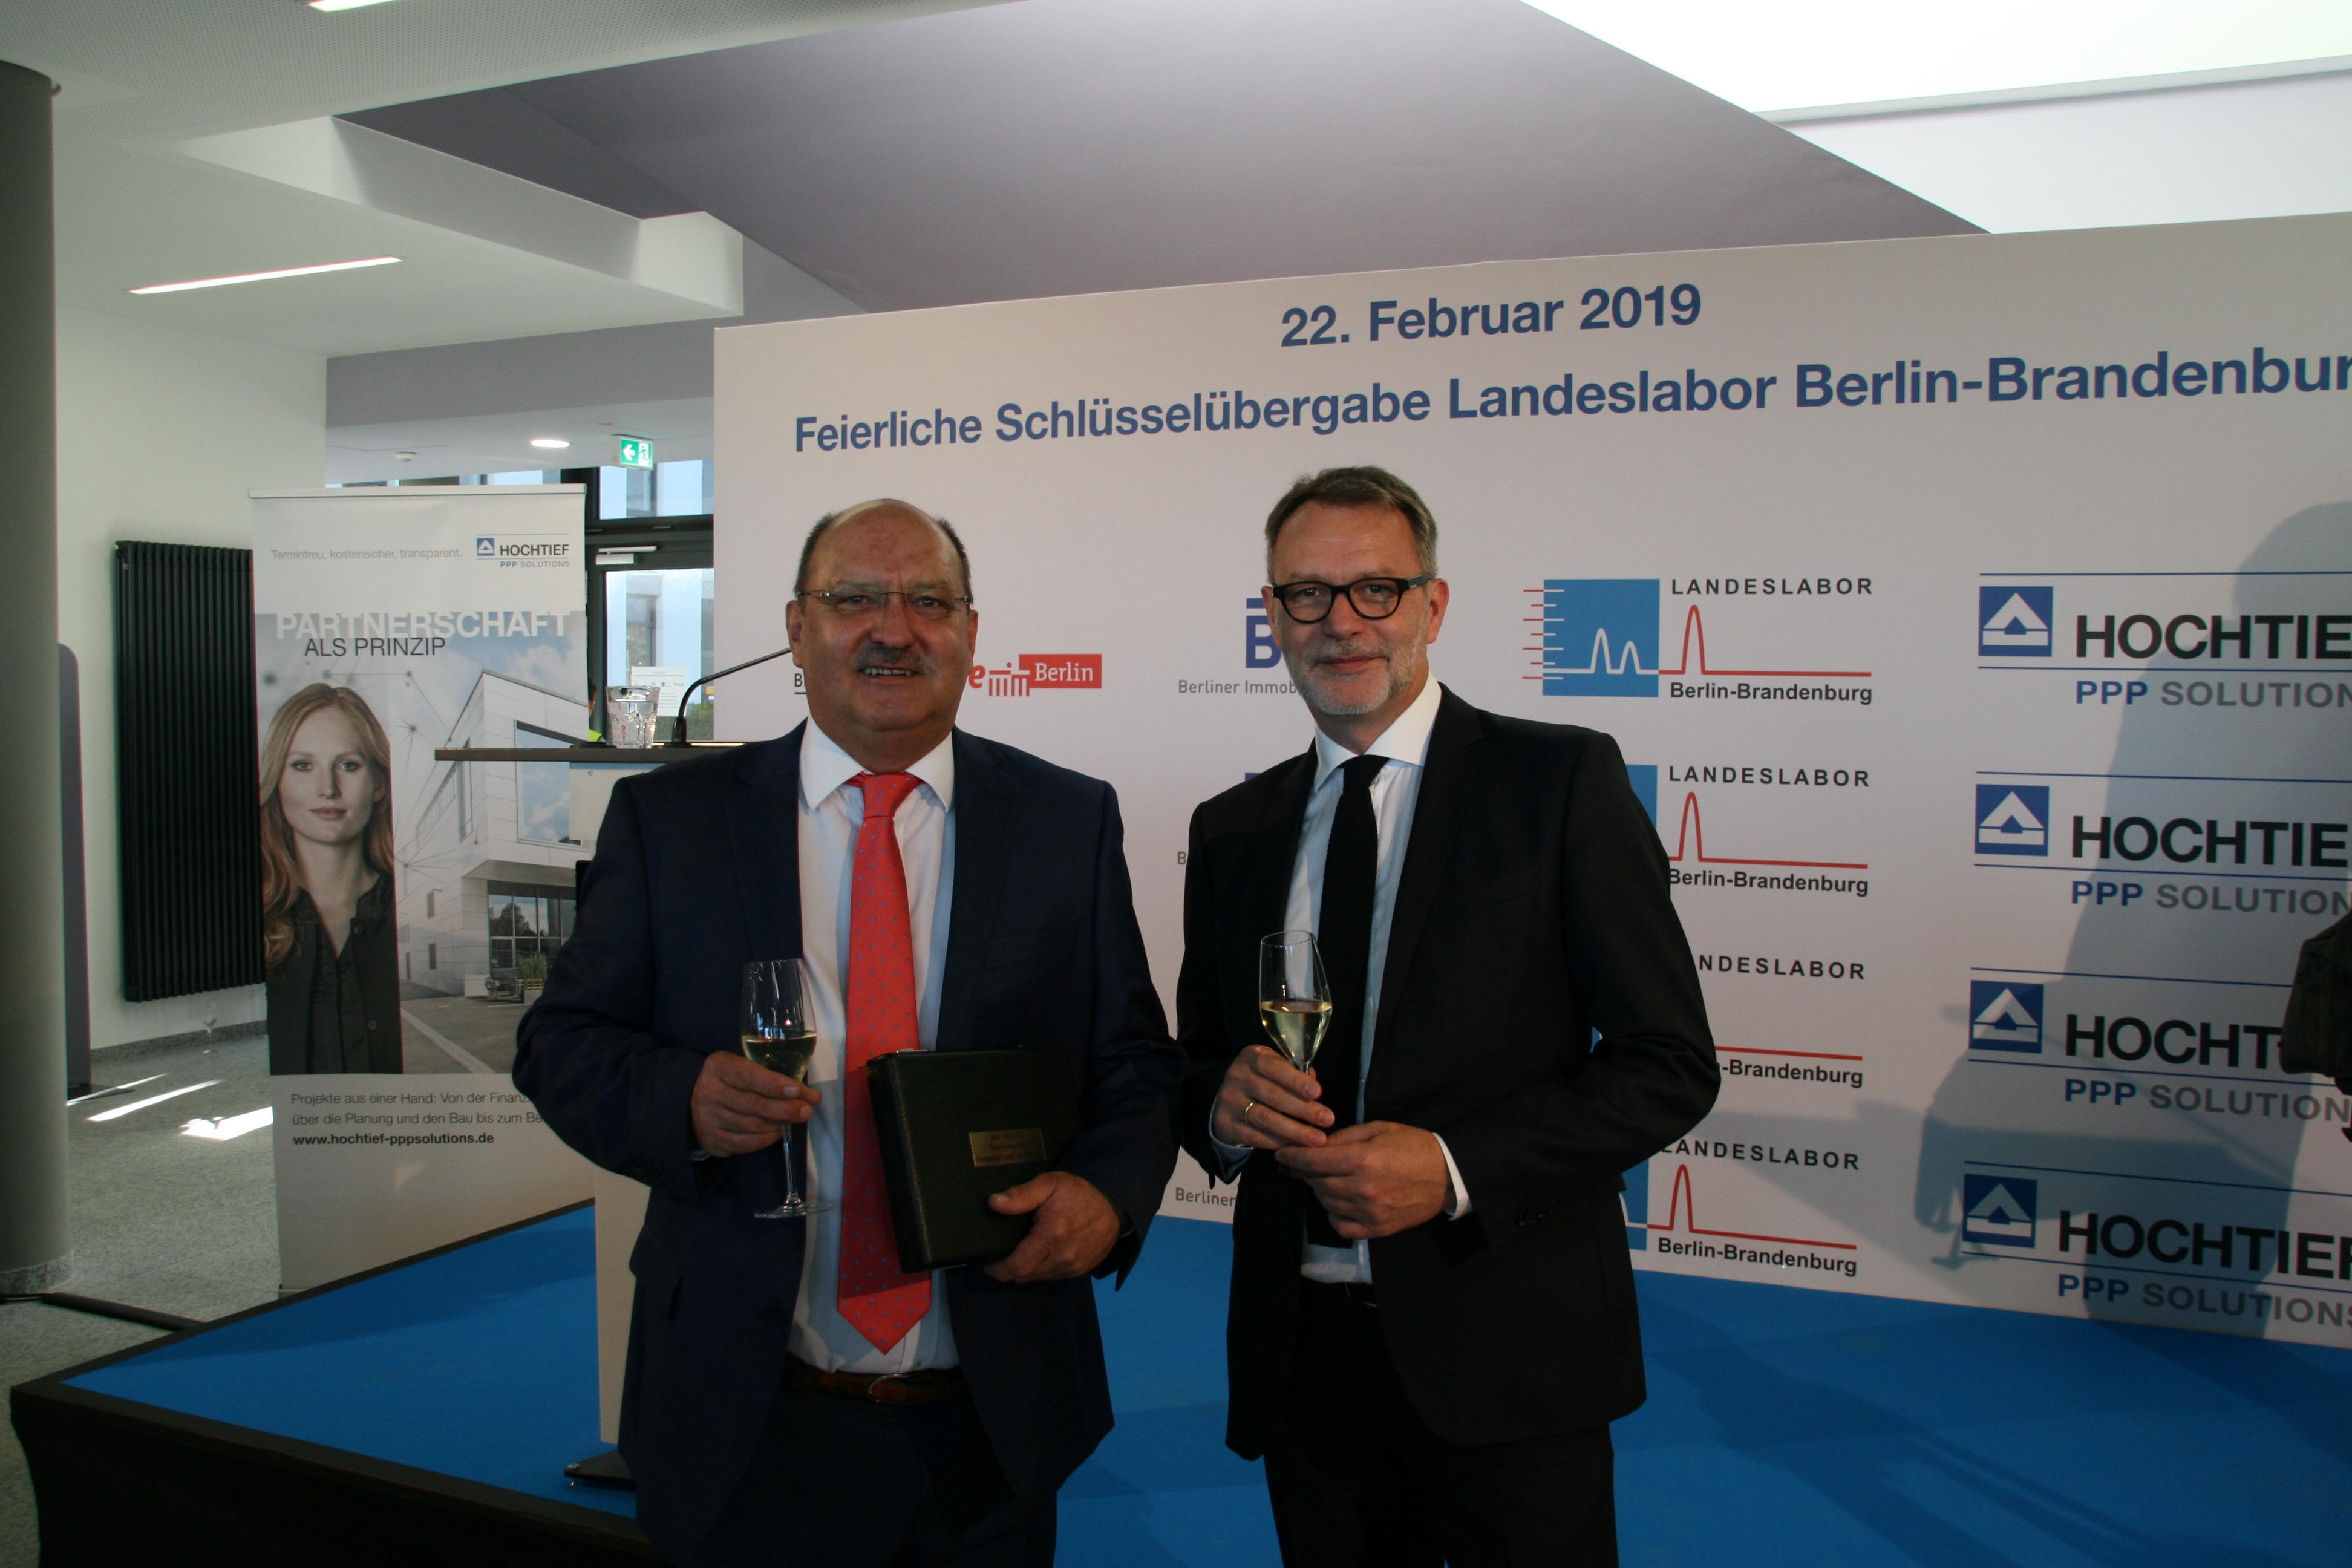 Norbert Buchholz, Direktor Landeslabor Berlin Brandenburg mit Tobias Ossenberg-Engels, Inhaber OECC.